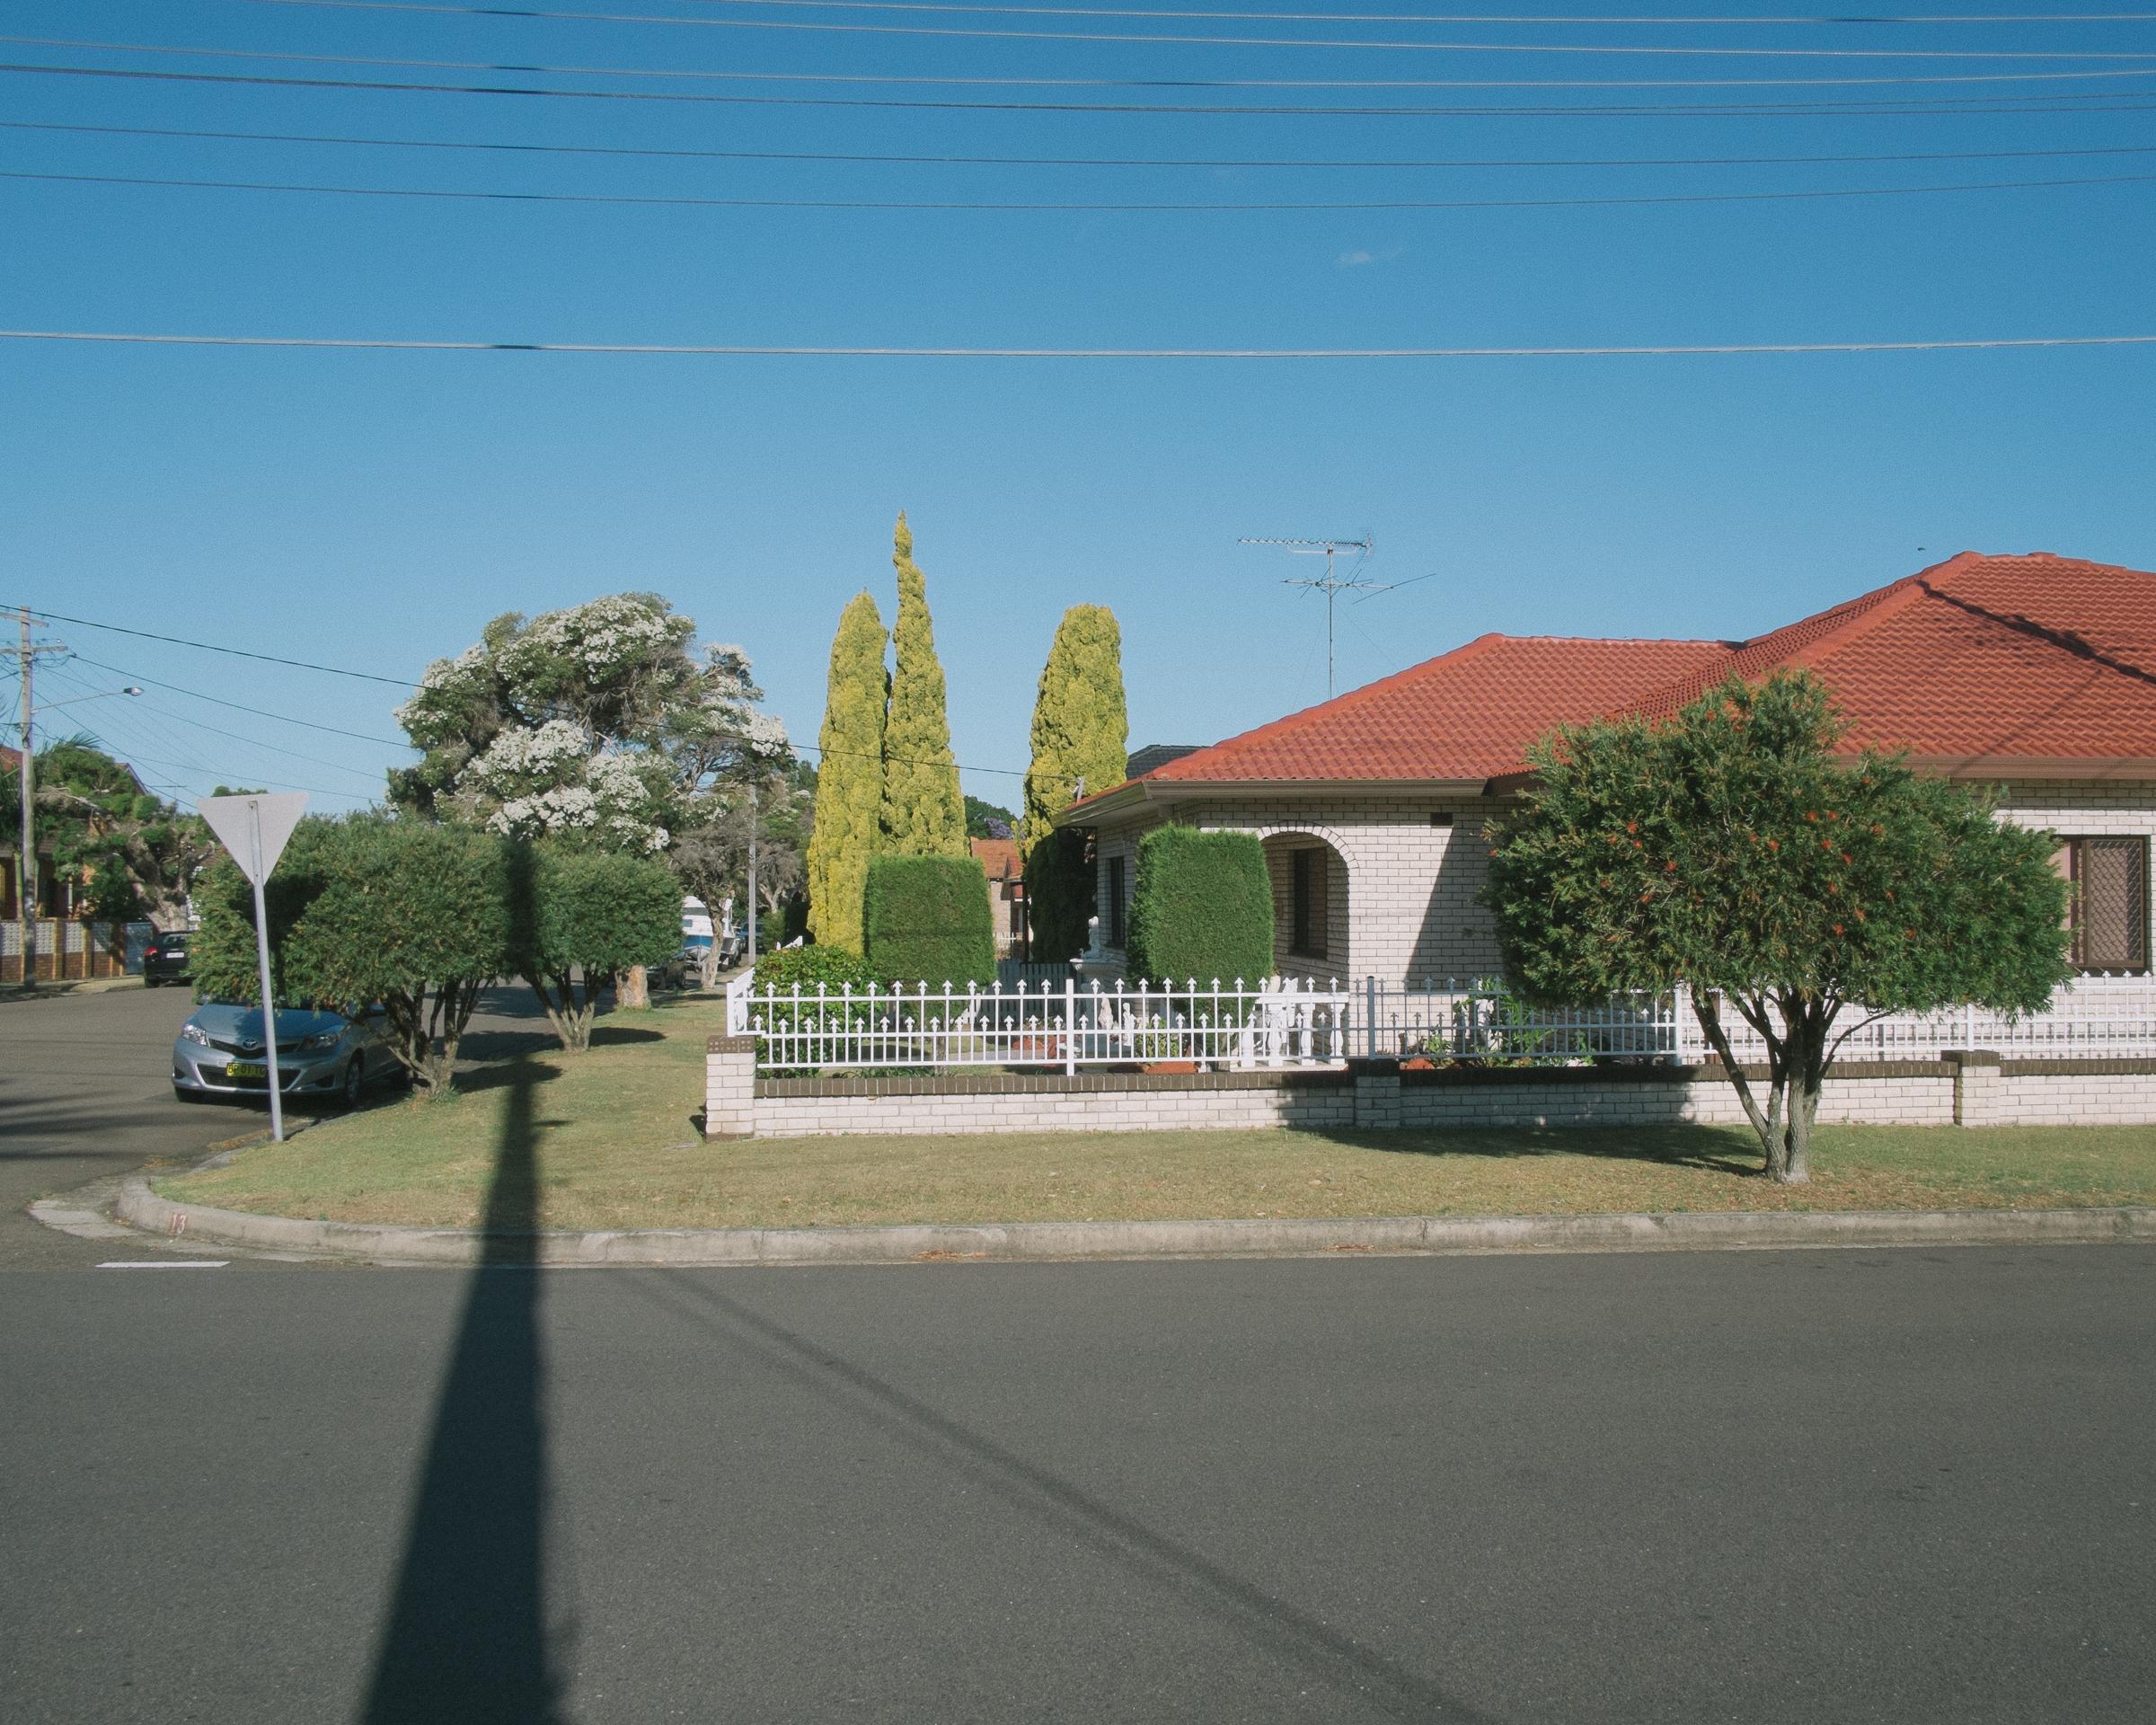 ids_suburbia-01-20.jpg